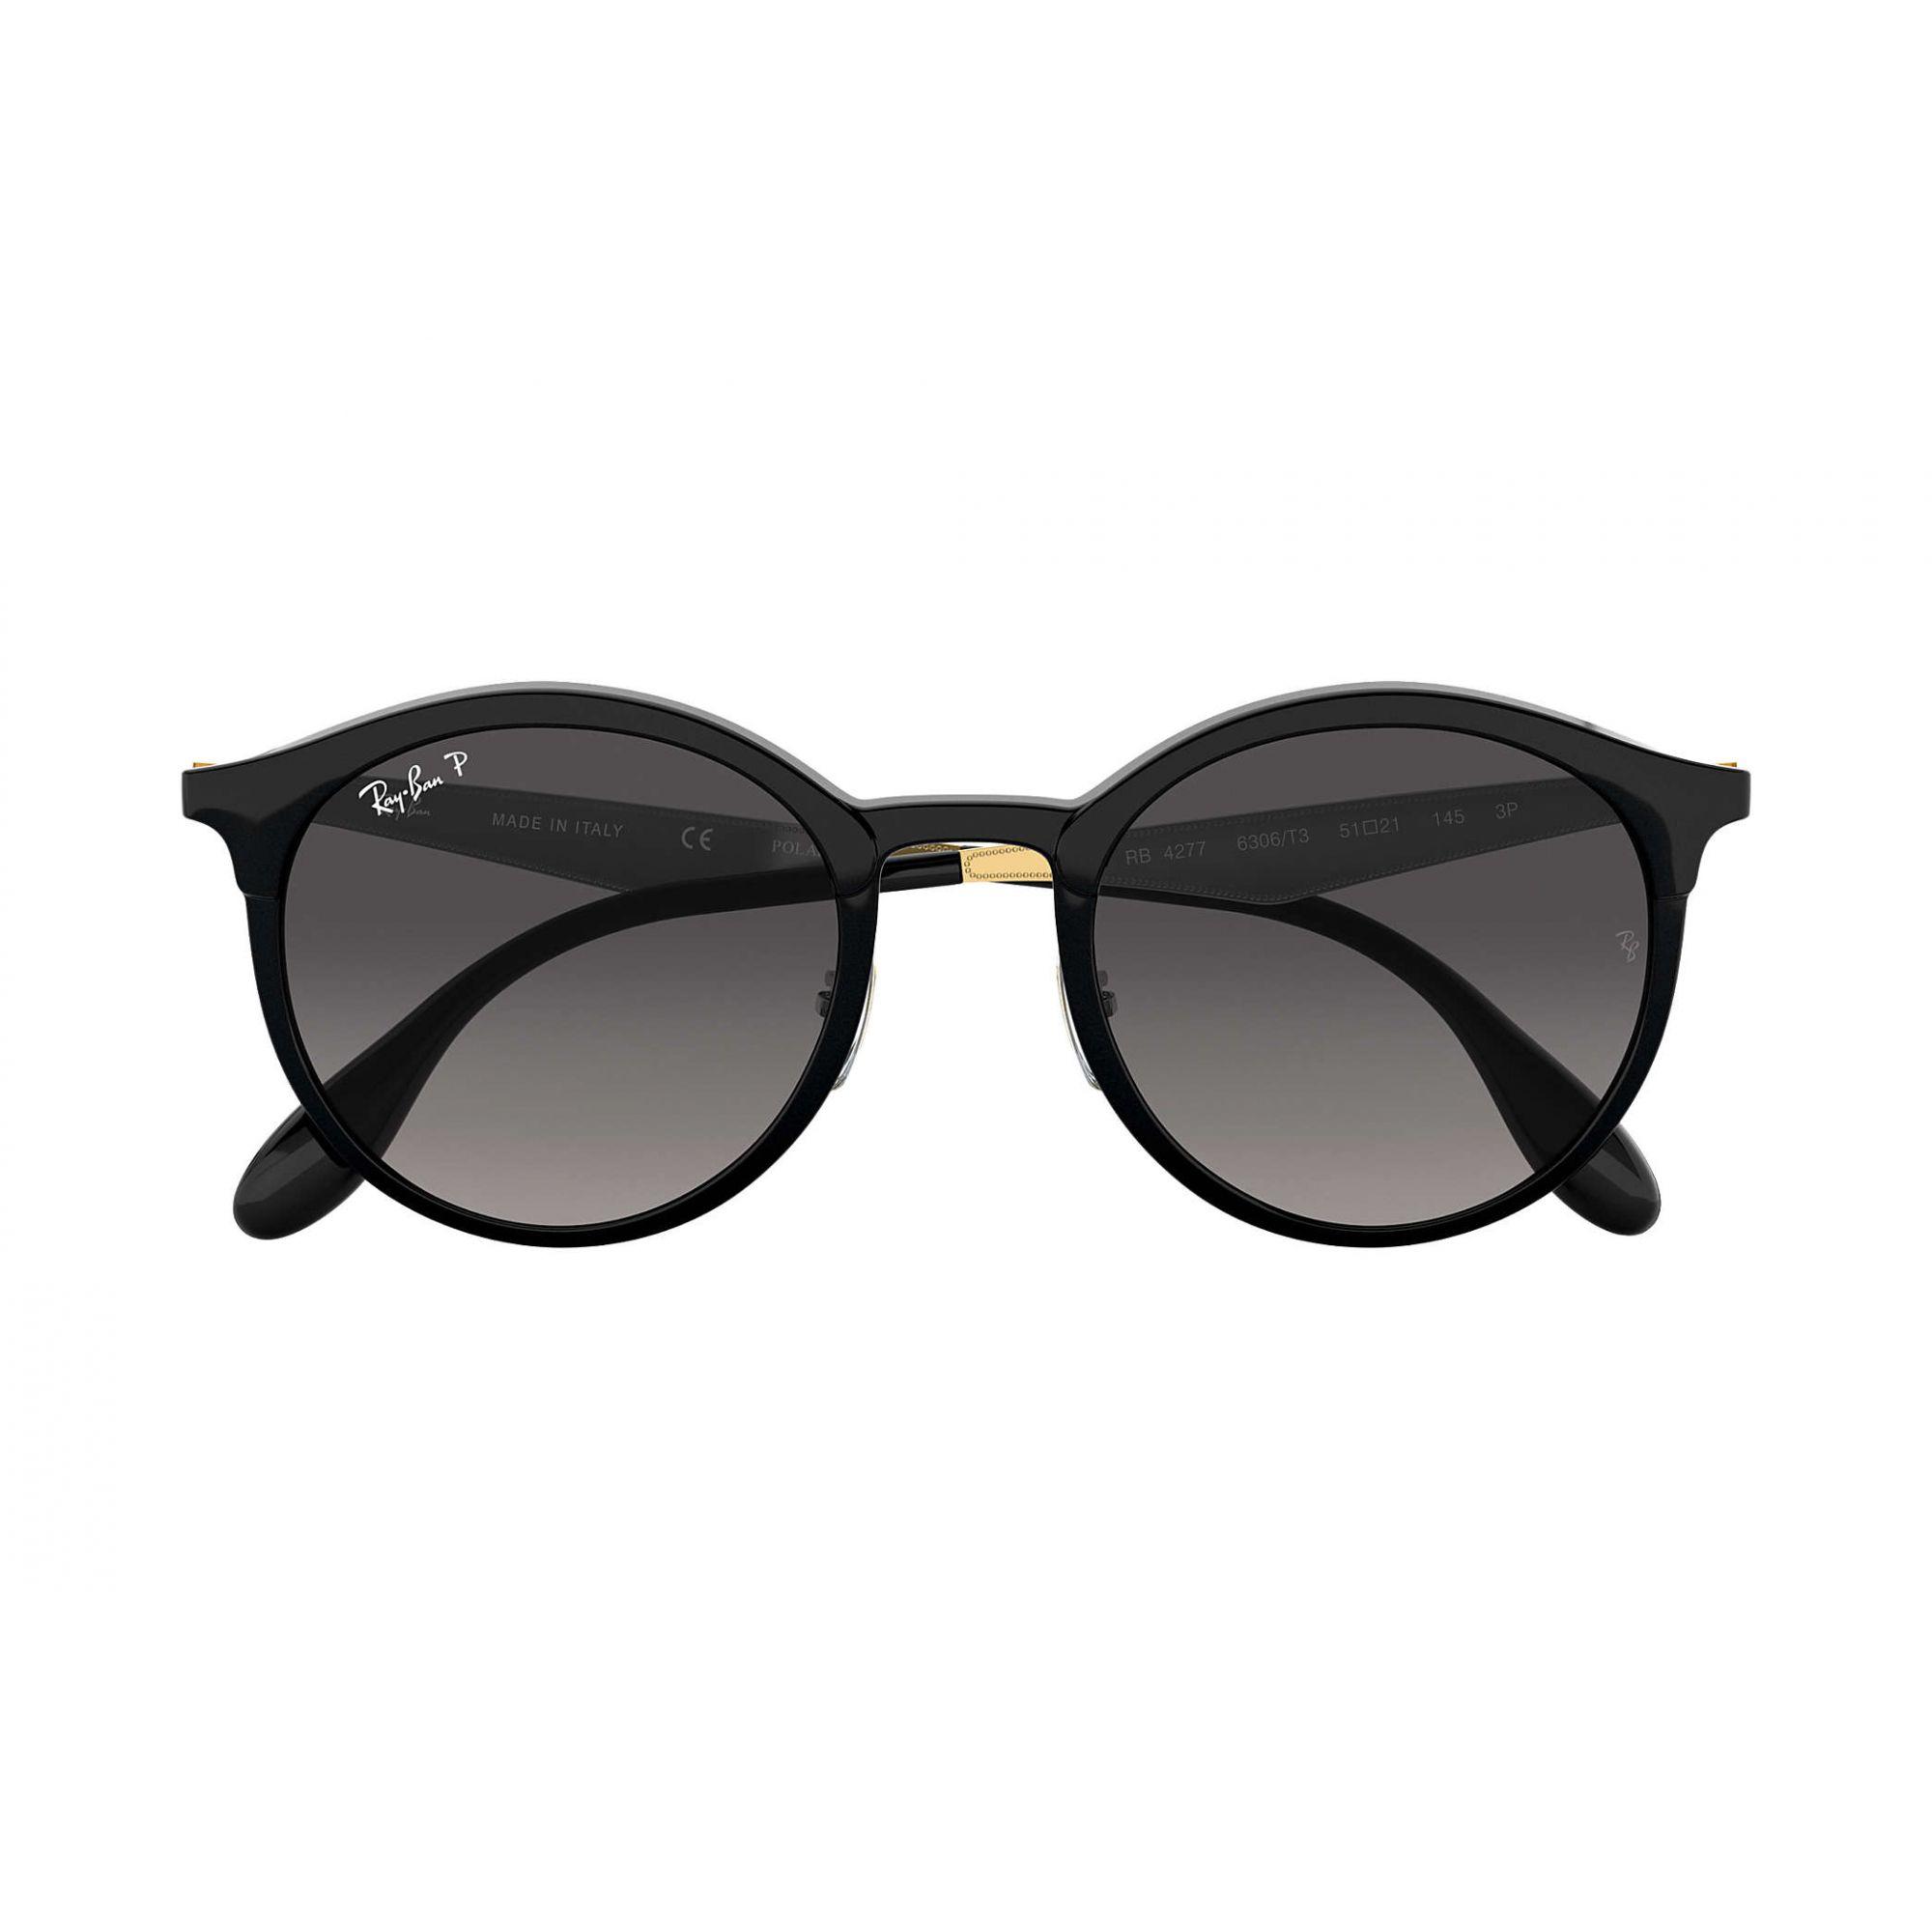 Ray Ban - RB4277 6306T351 - Óculos de sol